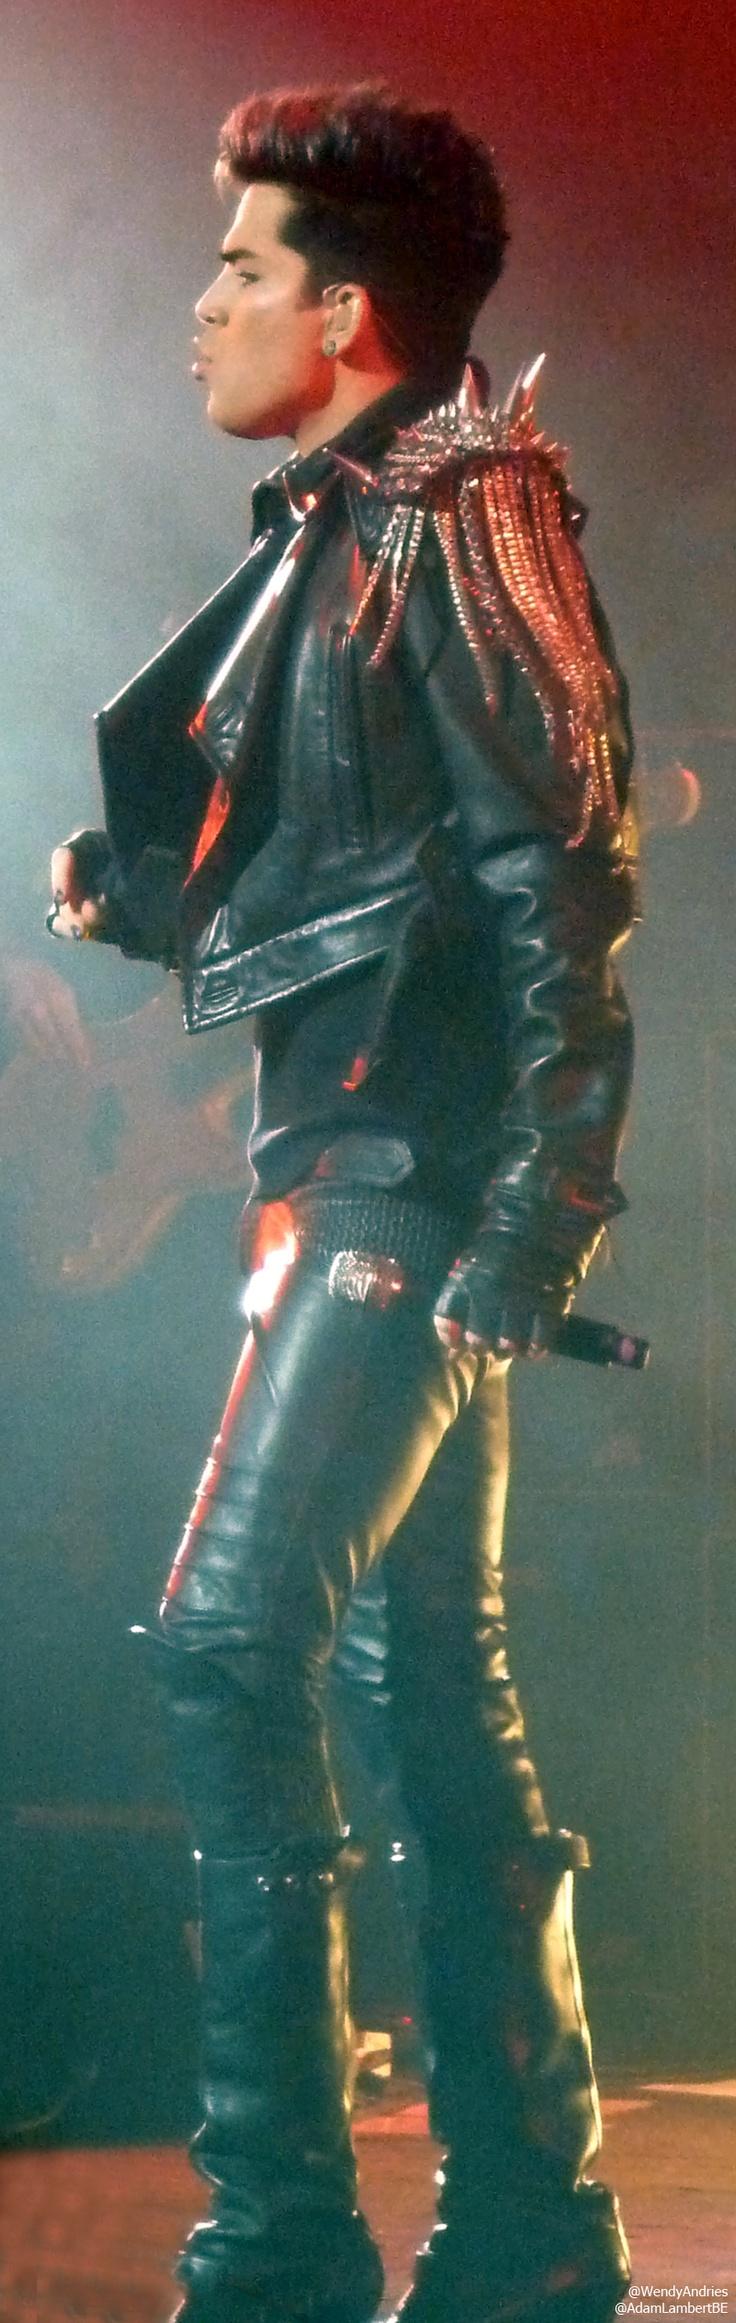 Adam Lambert, London show, 11th July 2012 | Source: @Wendy Felts Andries / @Adam M Lambert Belgium